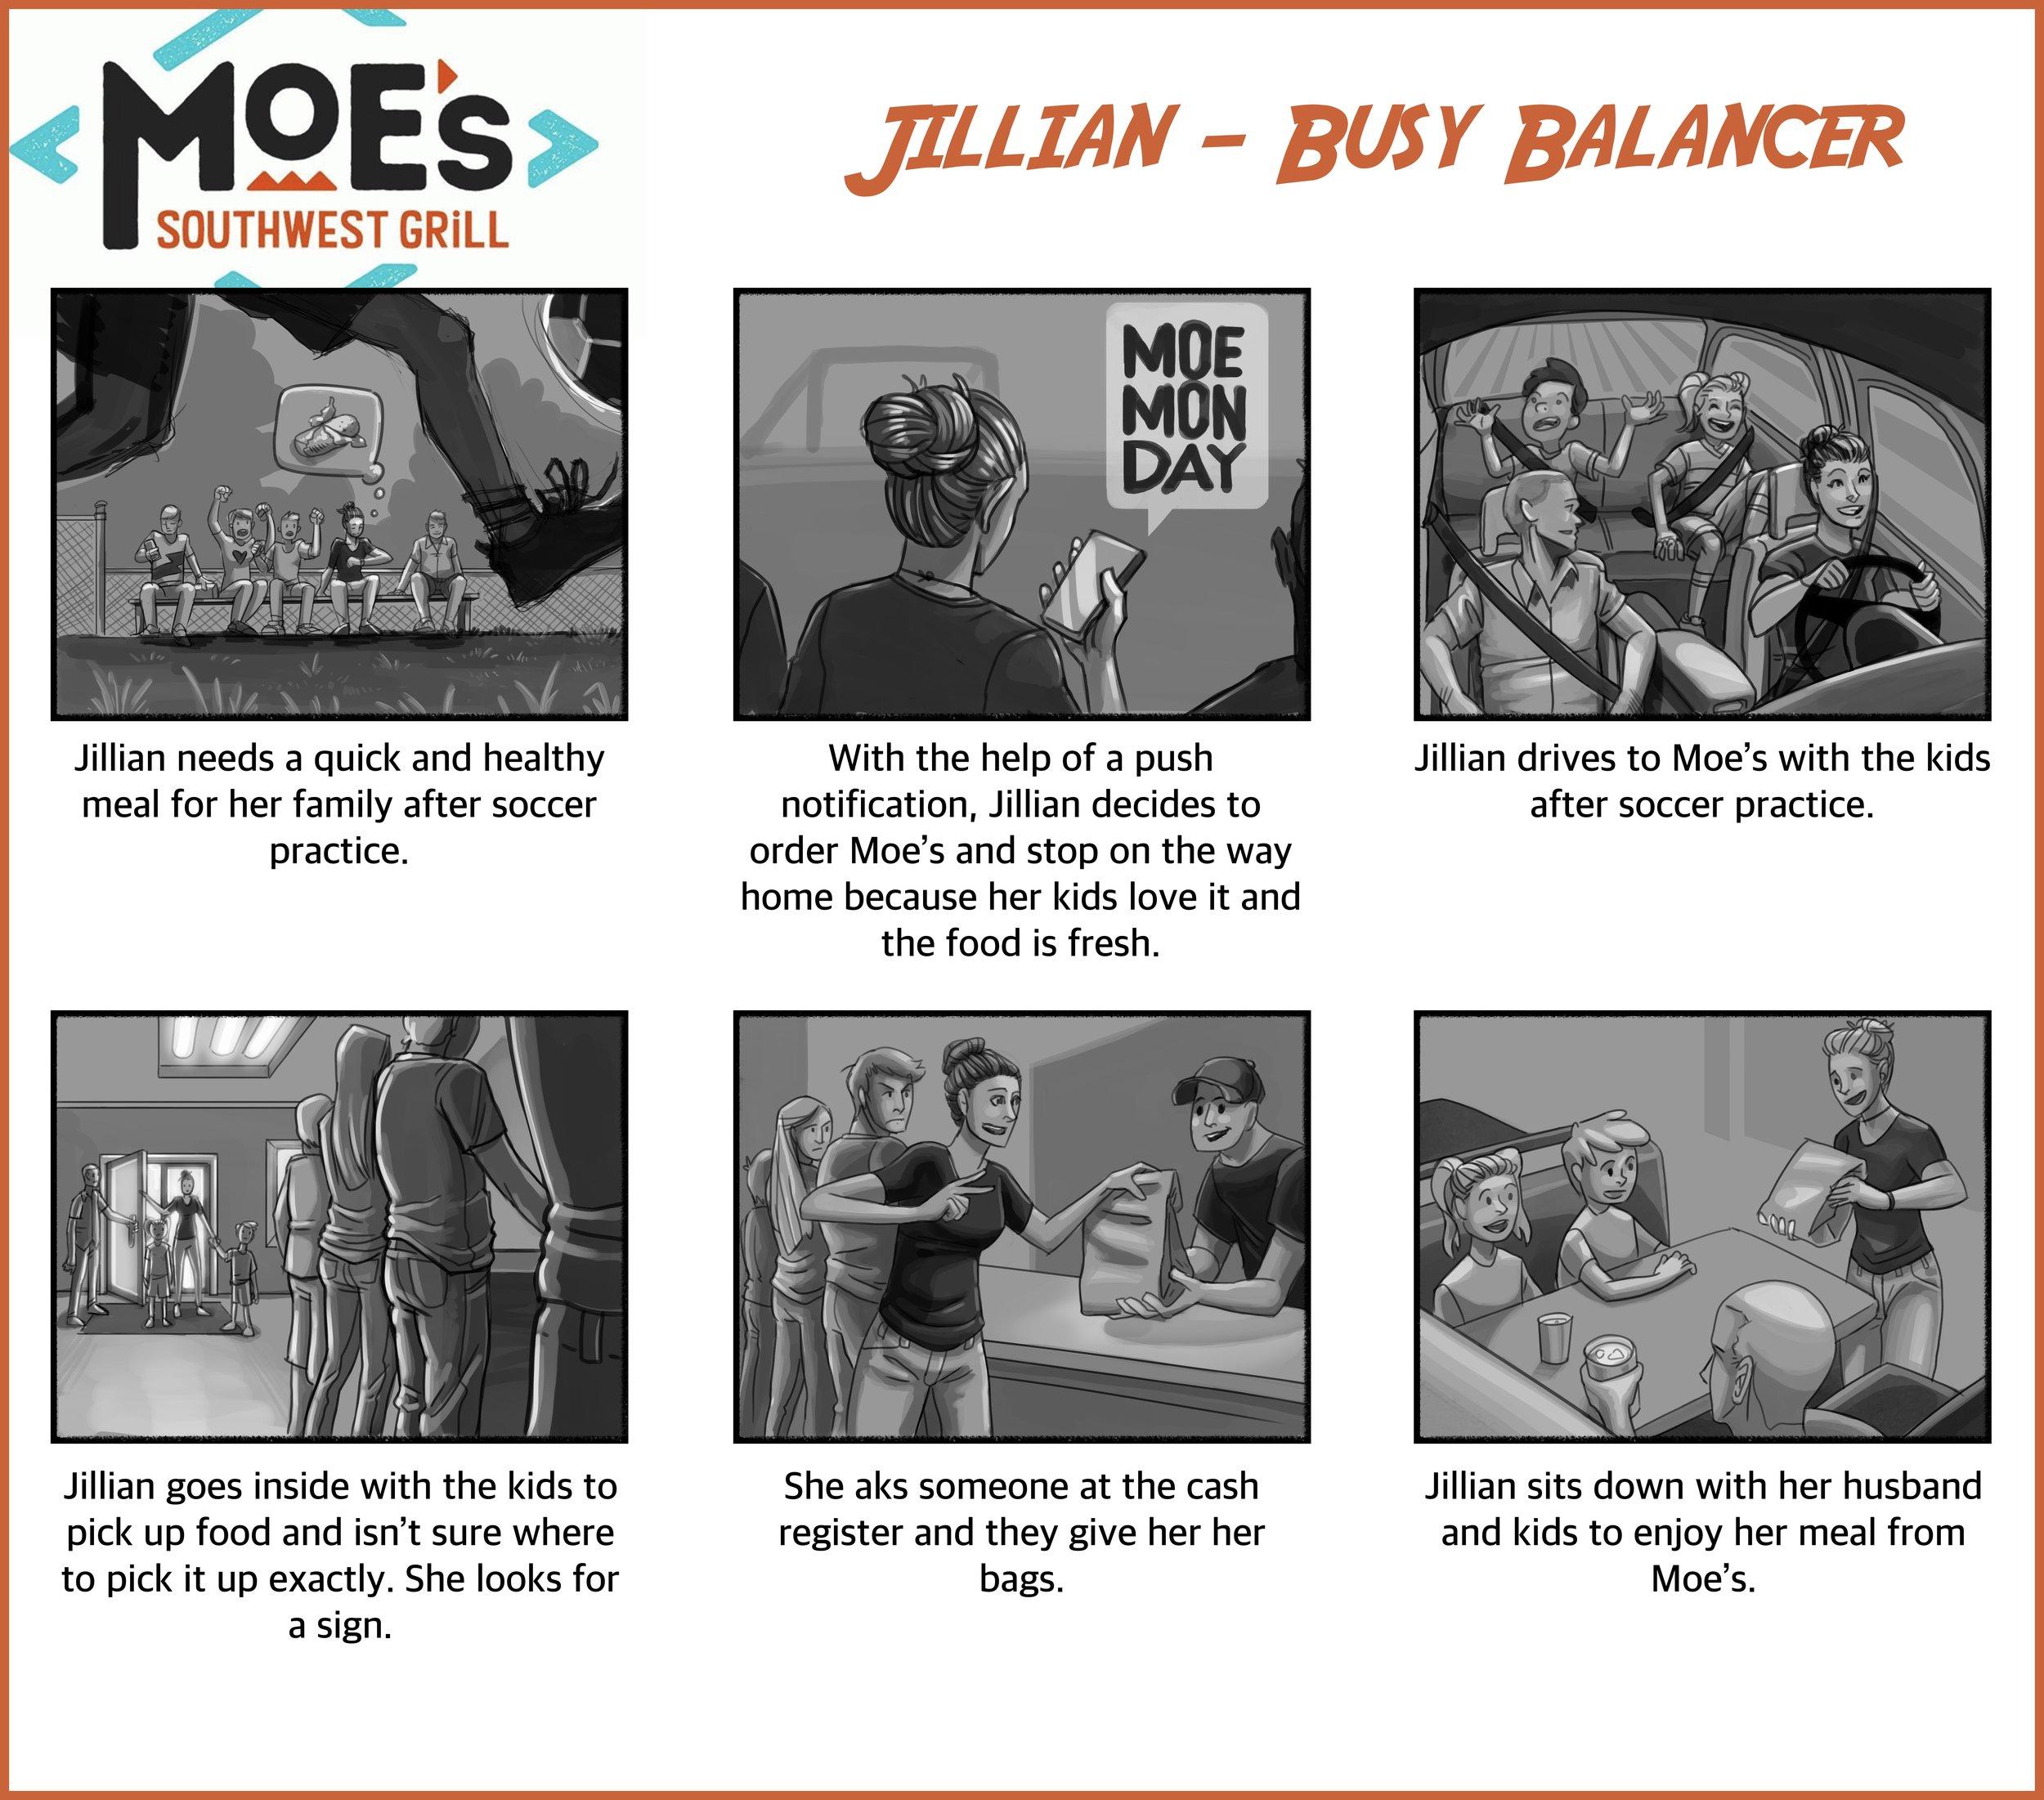 Storyboard - Busy Balancer